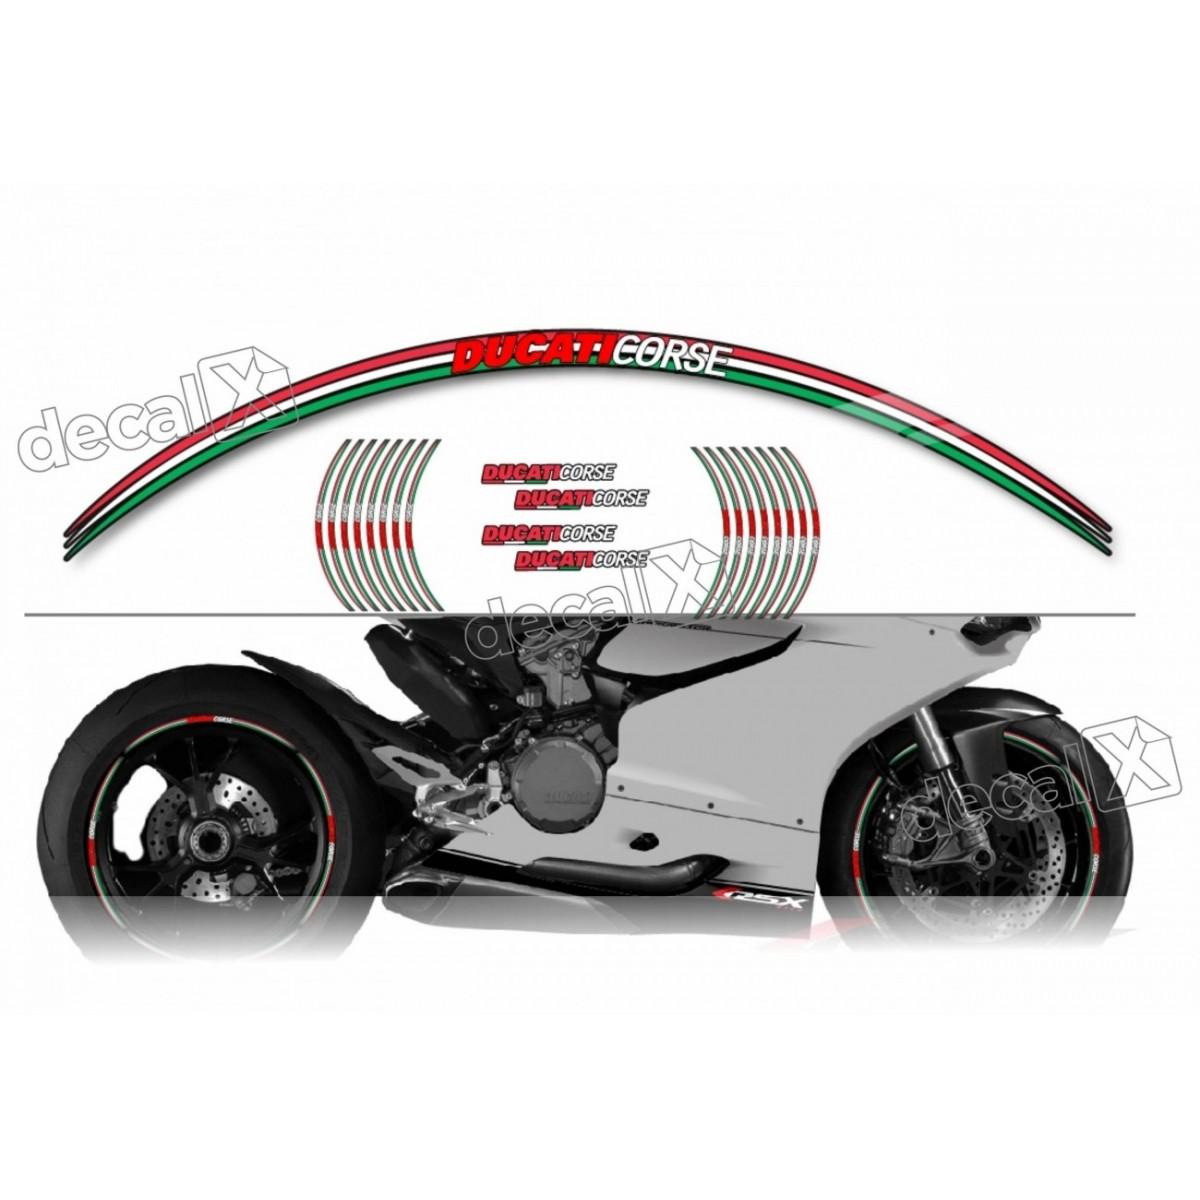 Kit Adesivo Friso Refletivo Roda Moto Ducati Corse Fri22